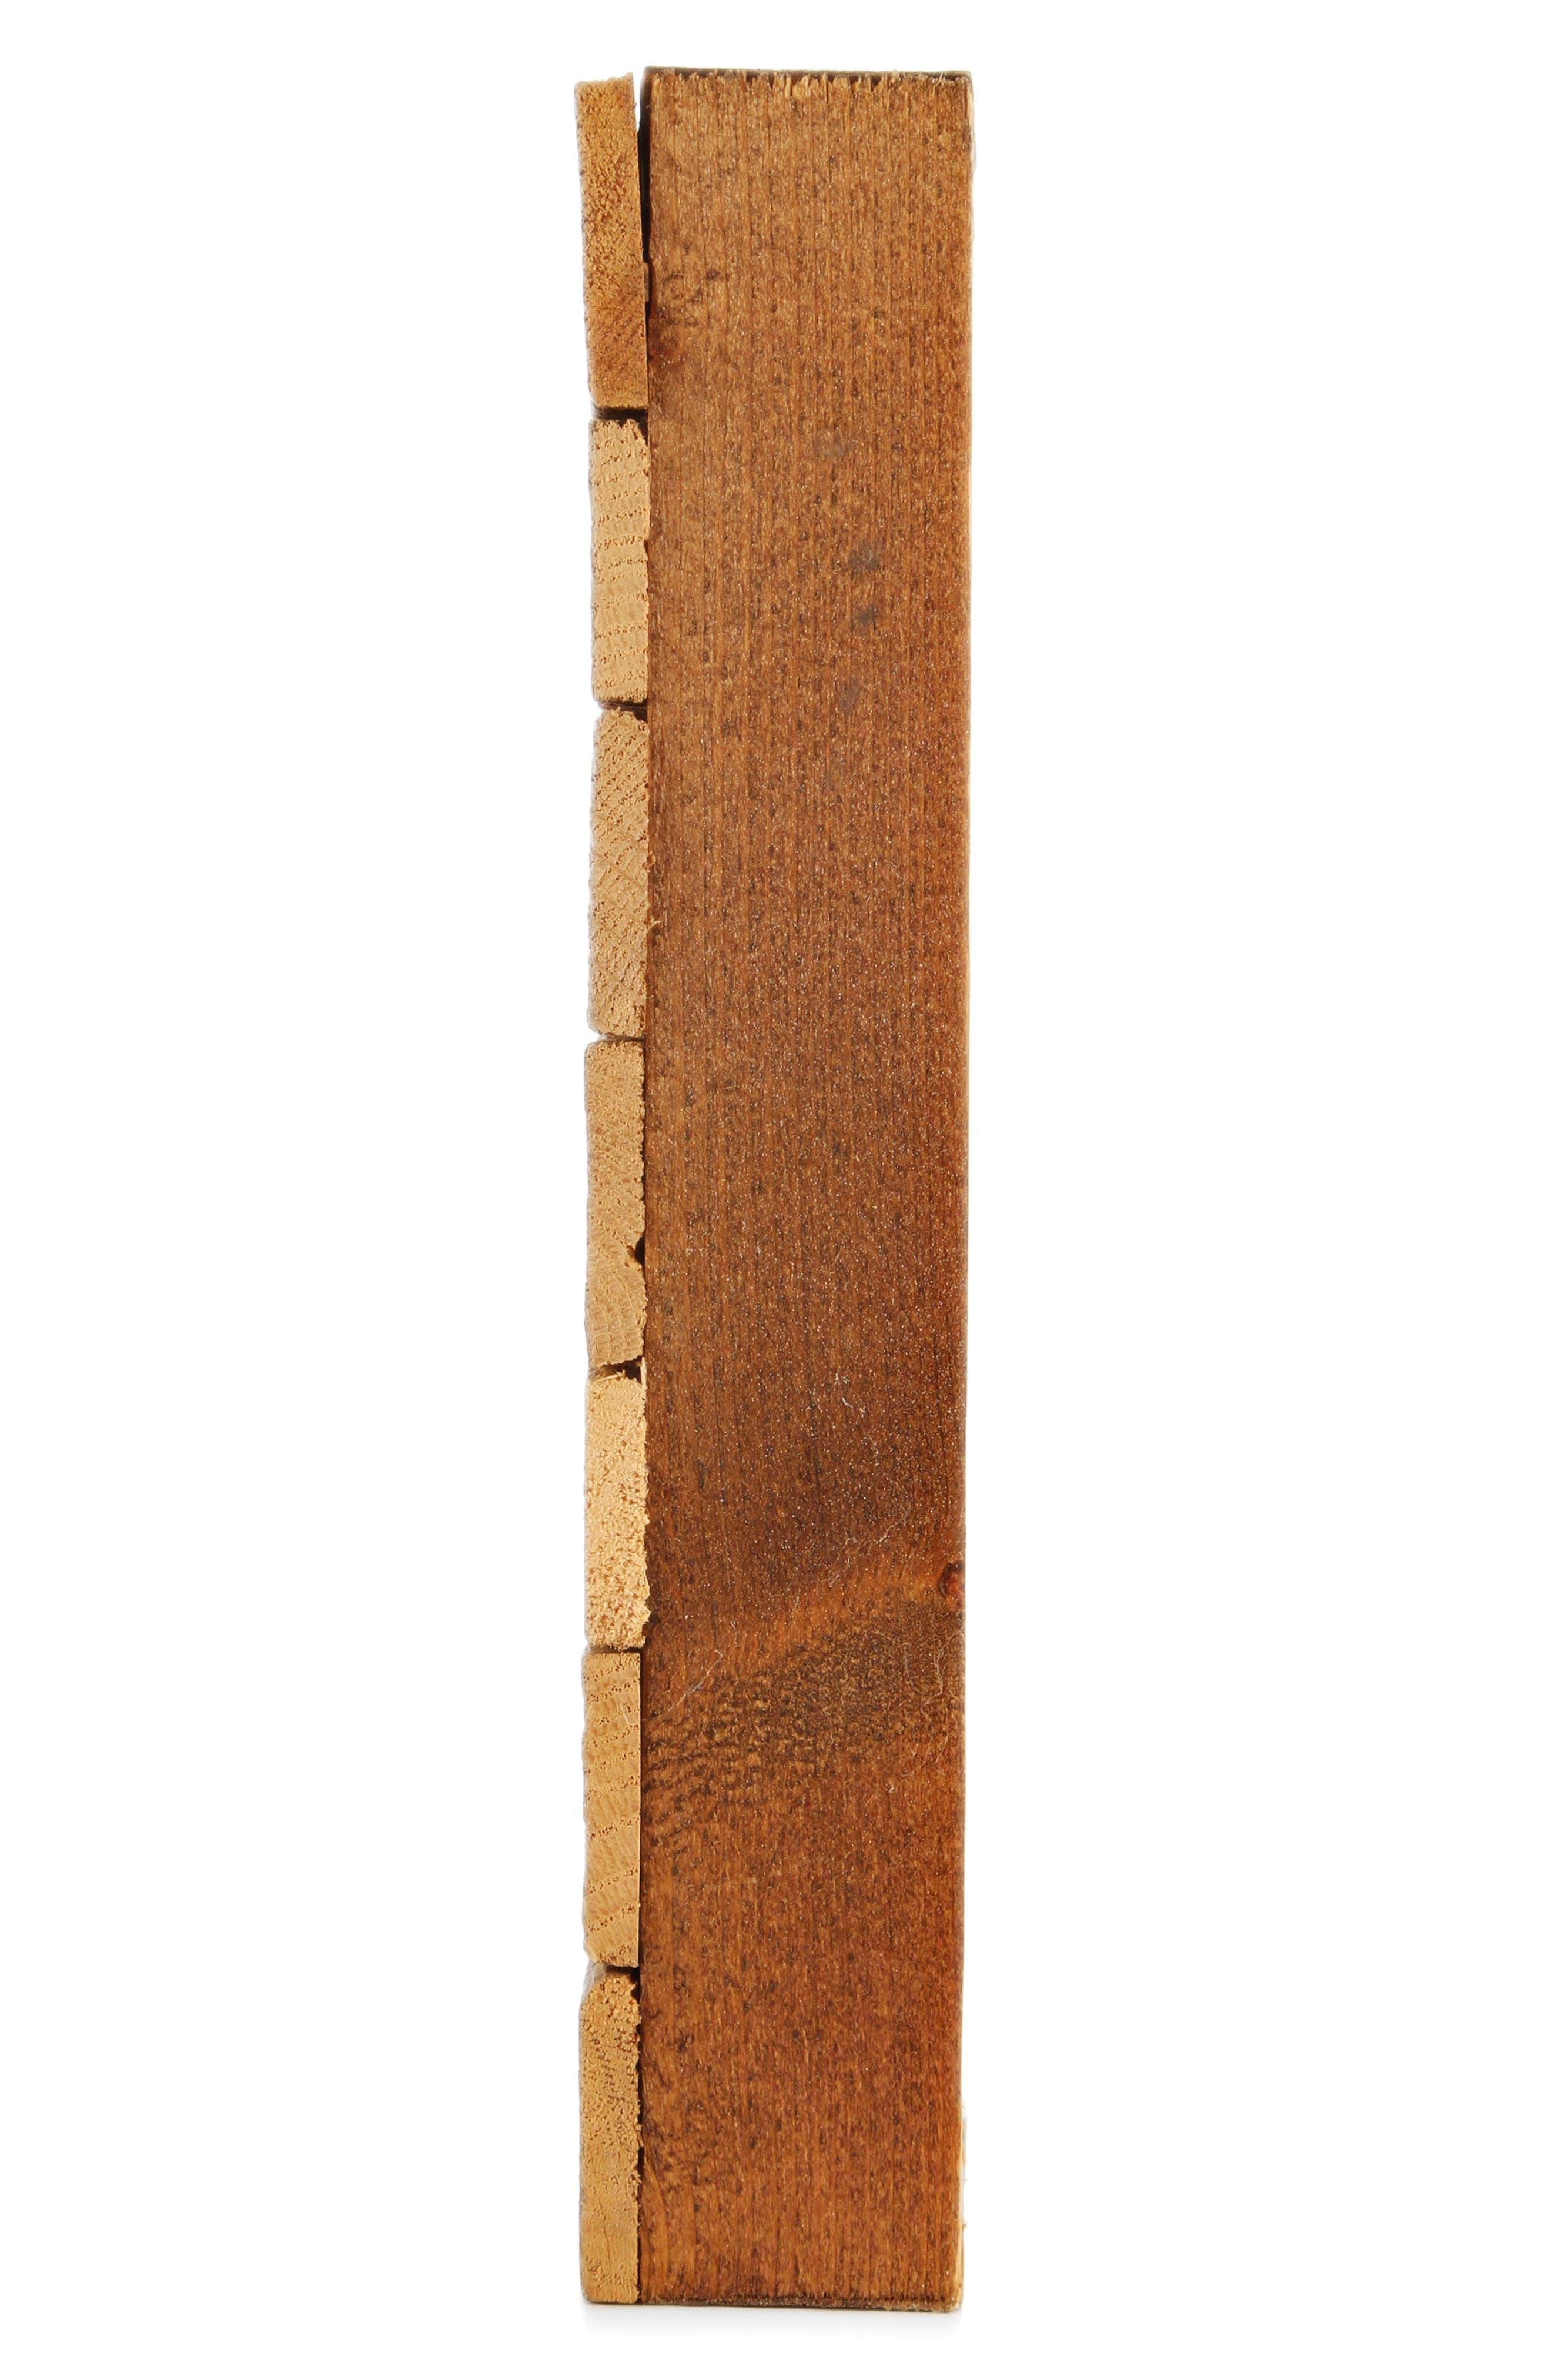 I Choose You Repurposed Wood Wall Art,                             Alternate thumbnail 3, color,                             200